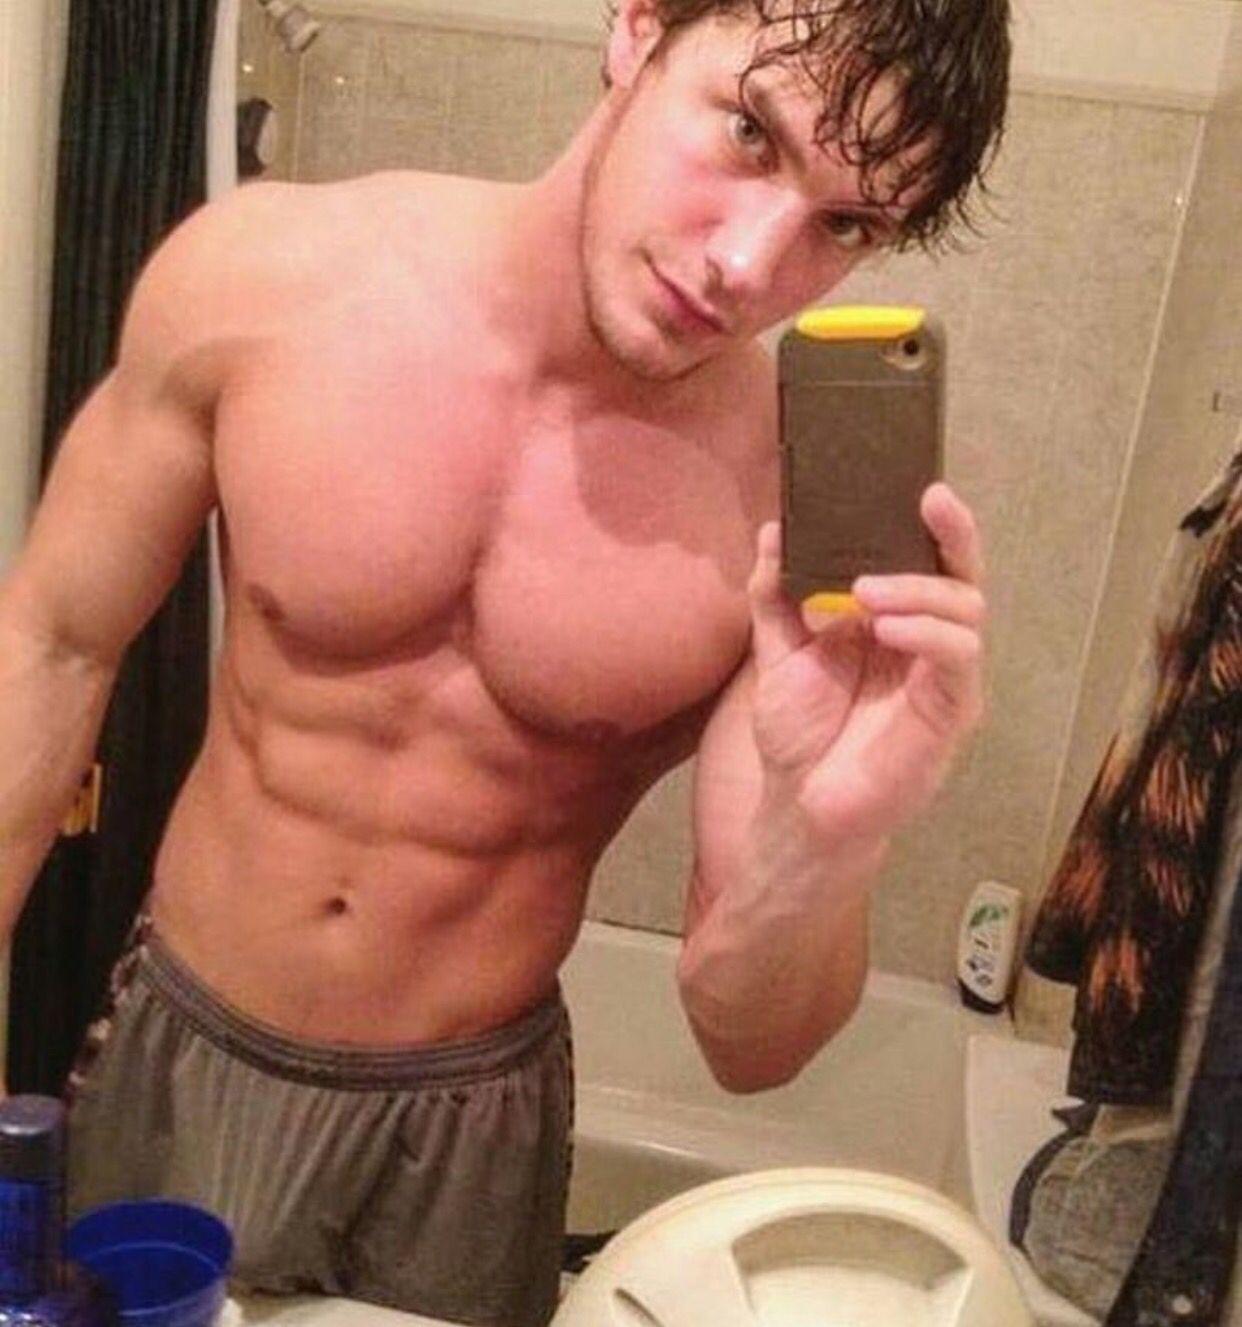 boy dick selfie